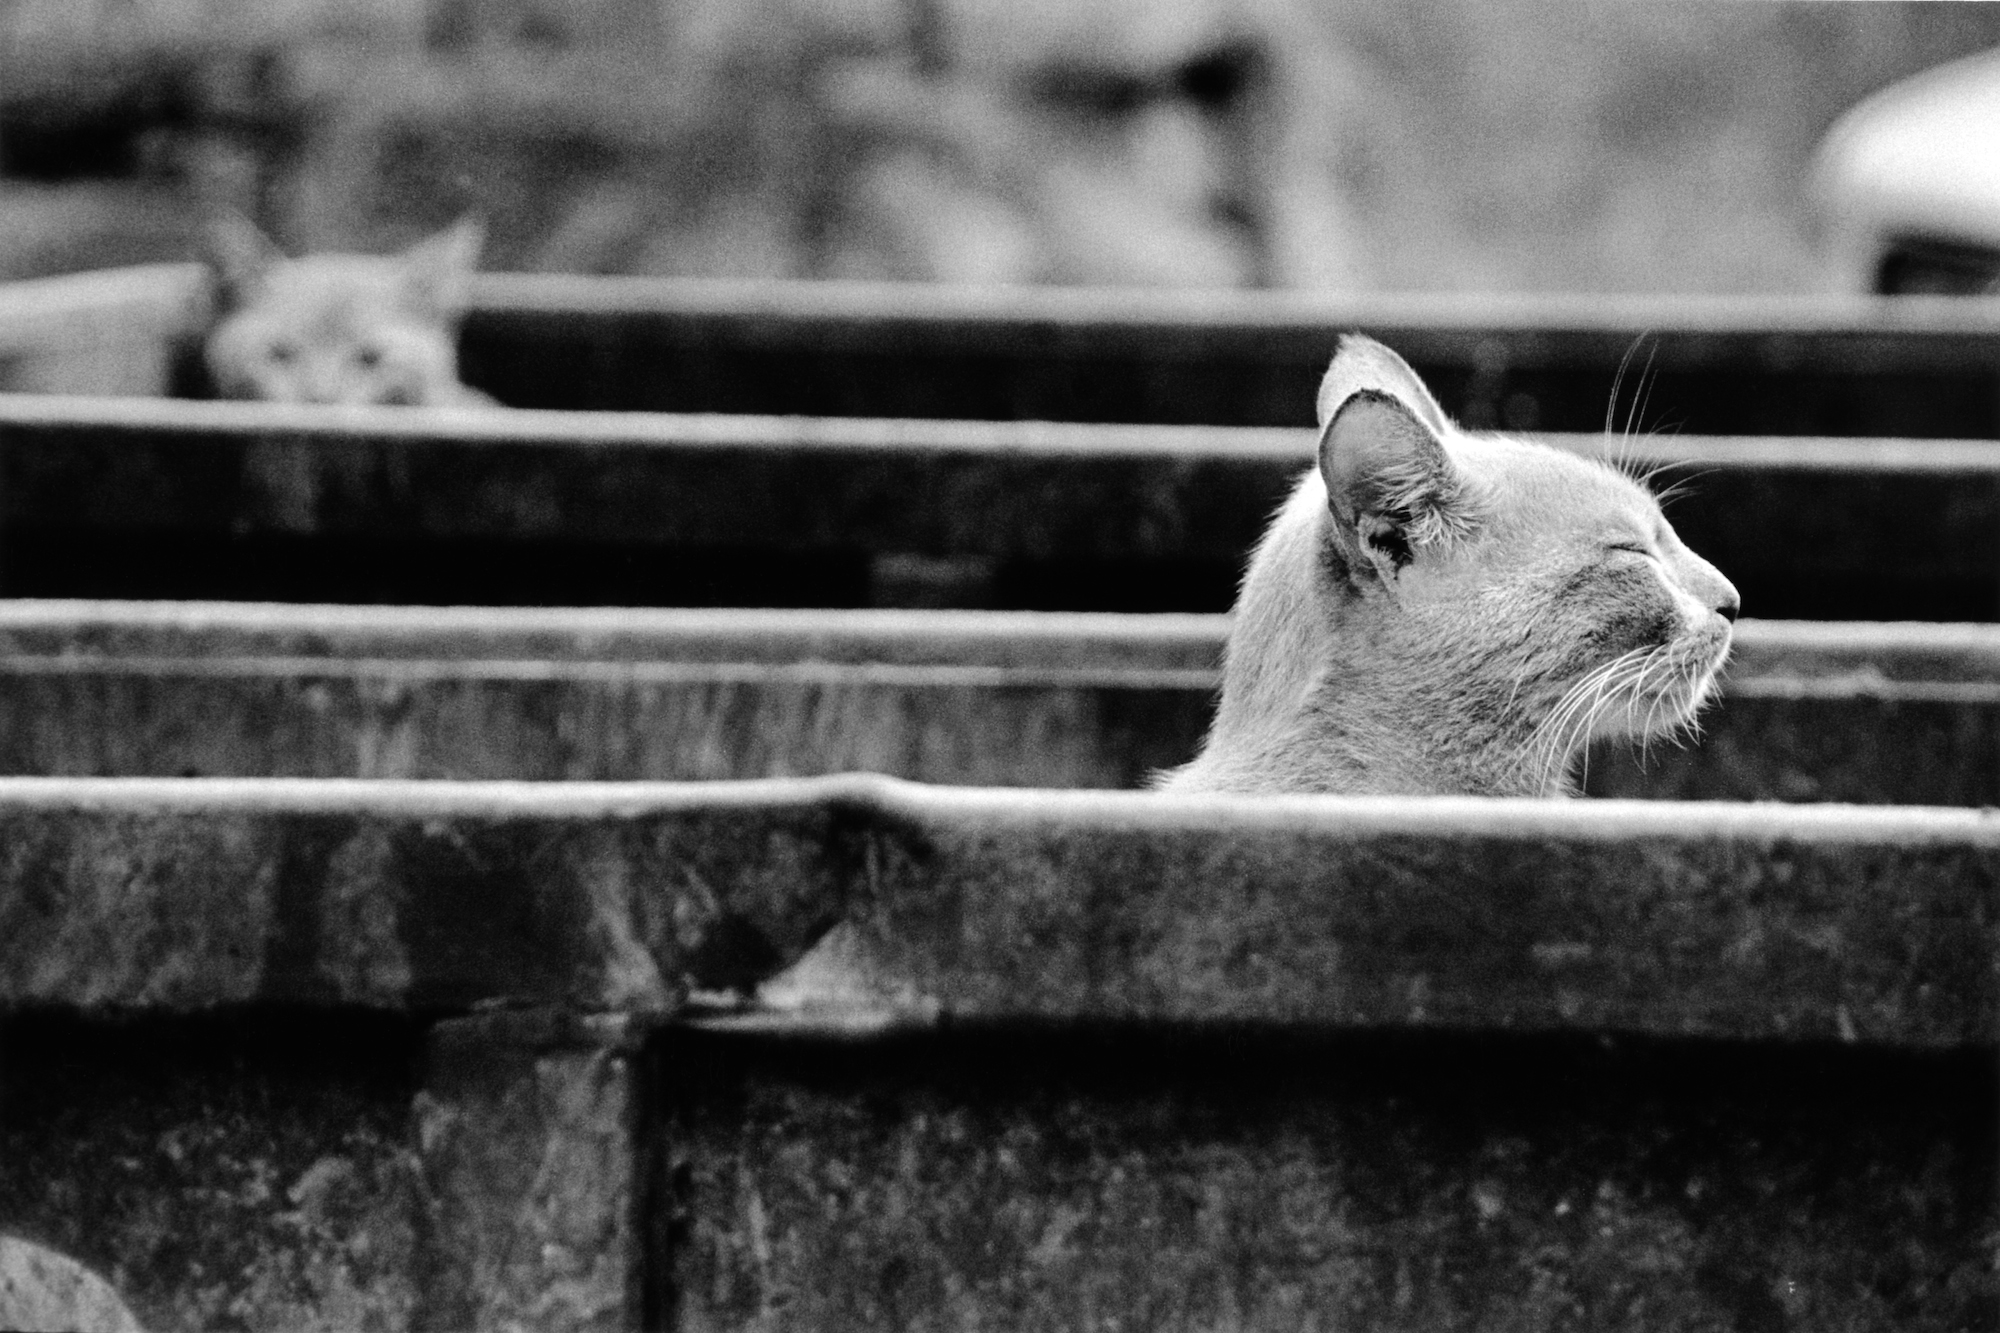 walter_rothwell_photography_cats-02.jpg